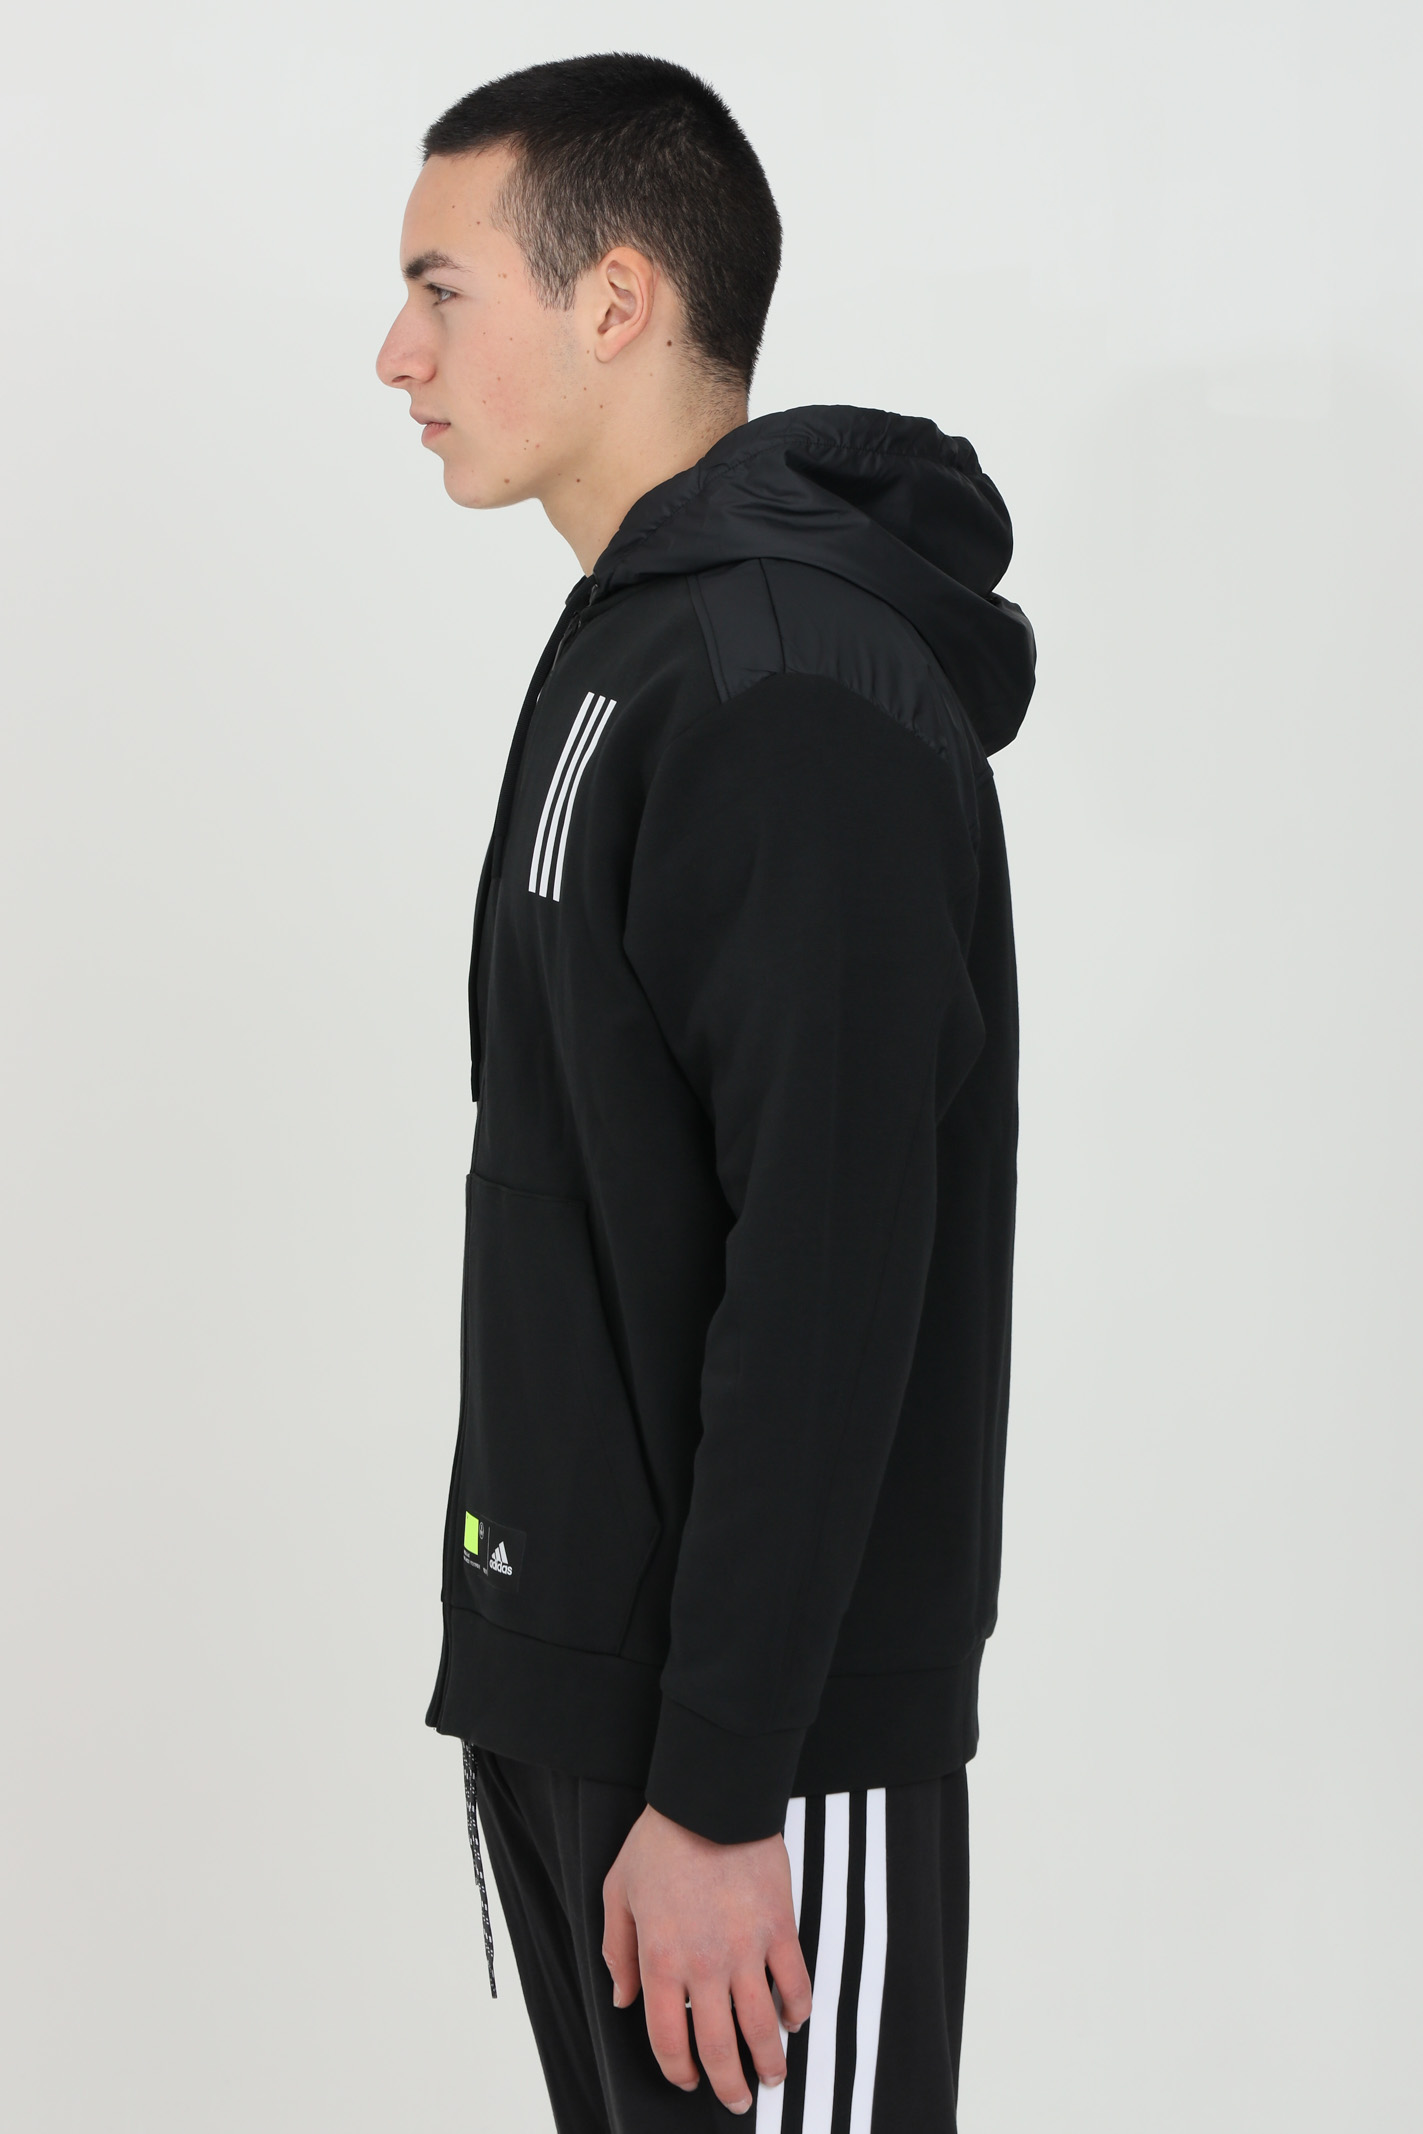 Giacca da ellenamento sportswear overlay zip ADIDAS | Felpe | GM5783.